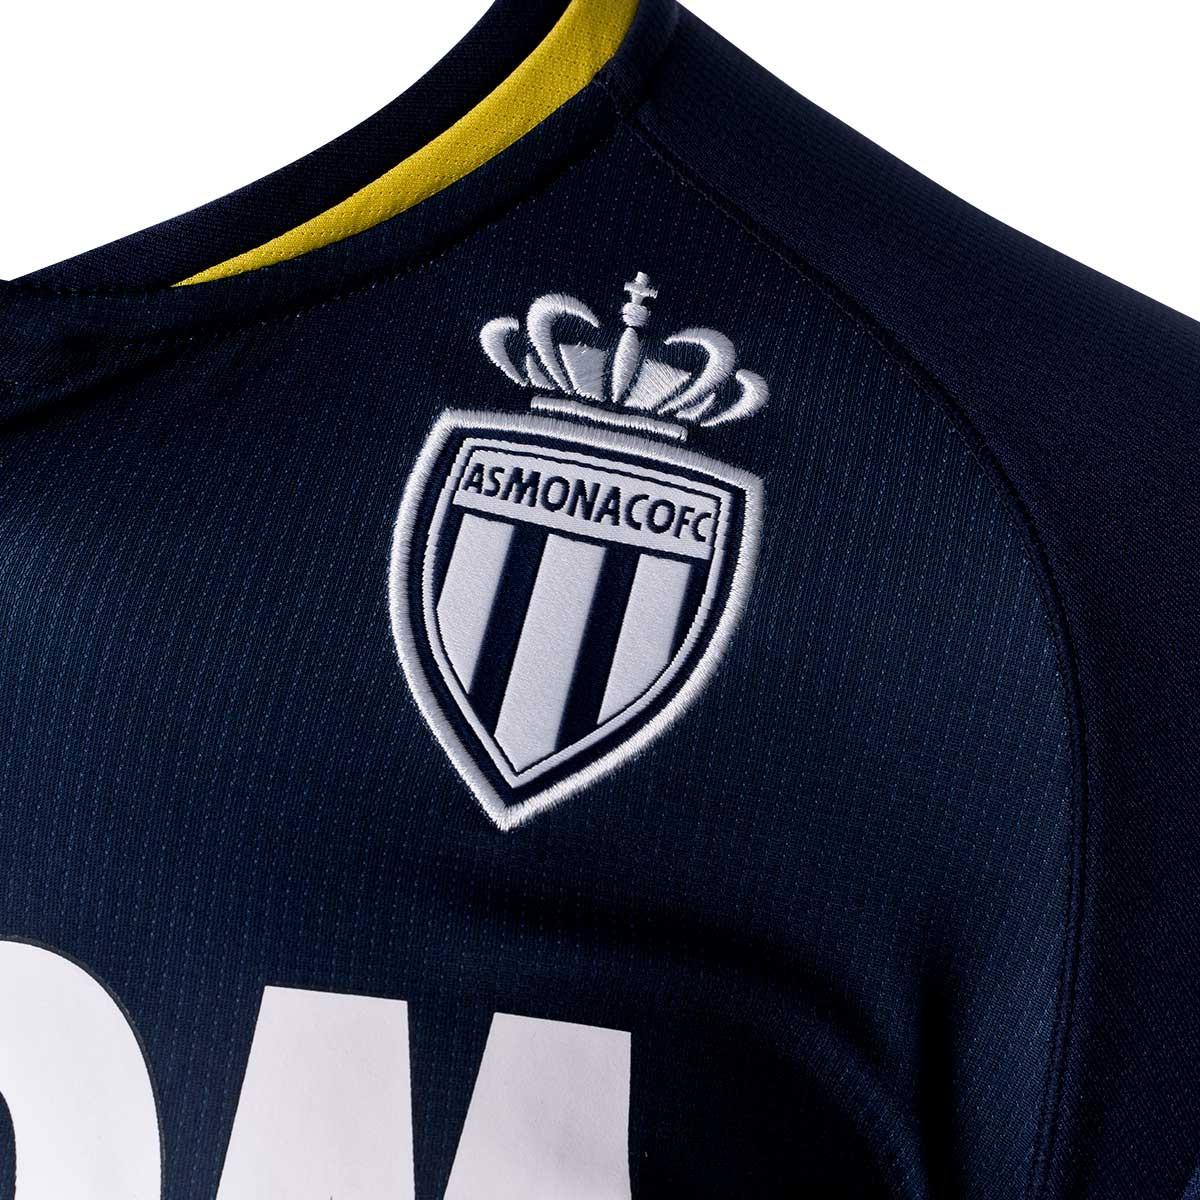 Maglia Kappa AS Monaco FC Secondo Kit 2020-2021